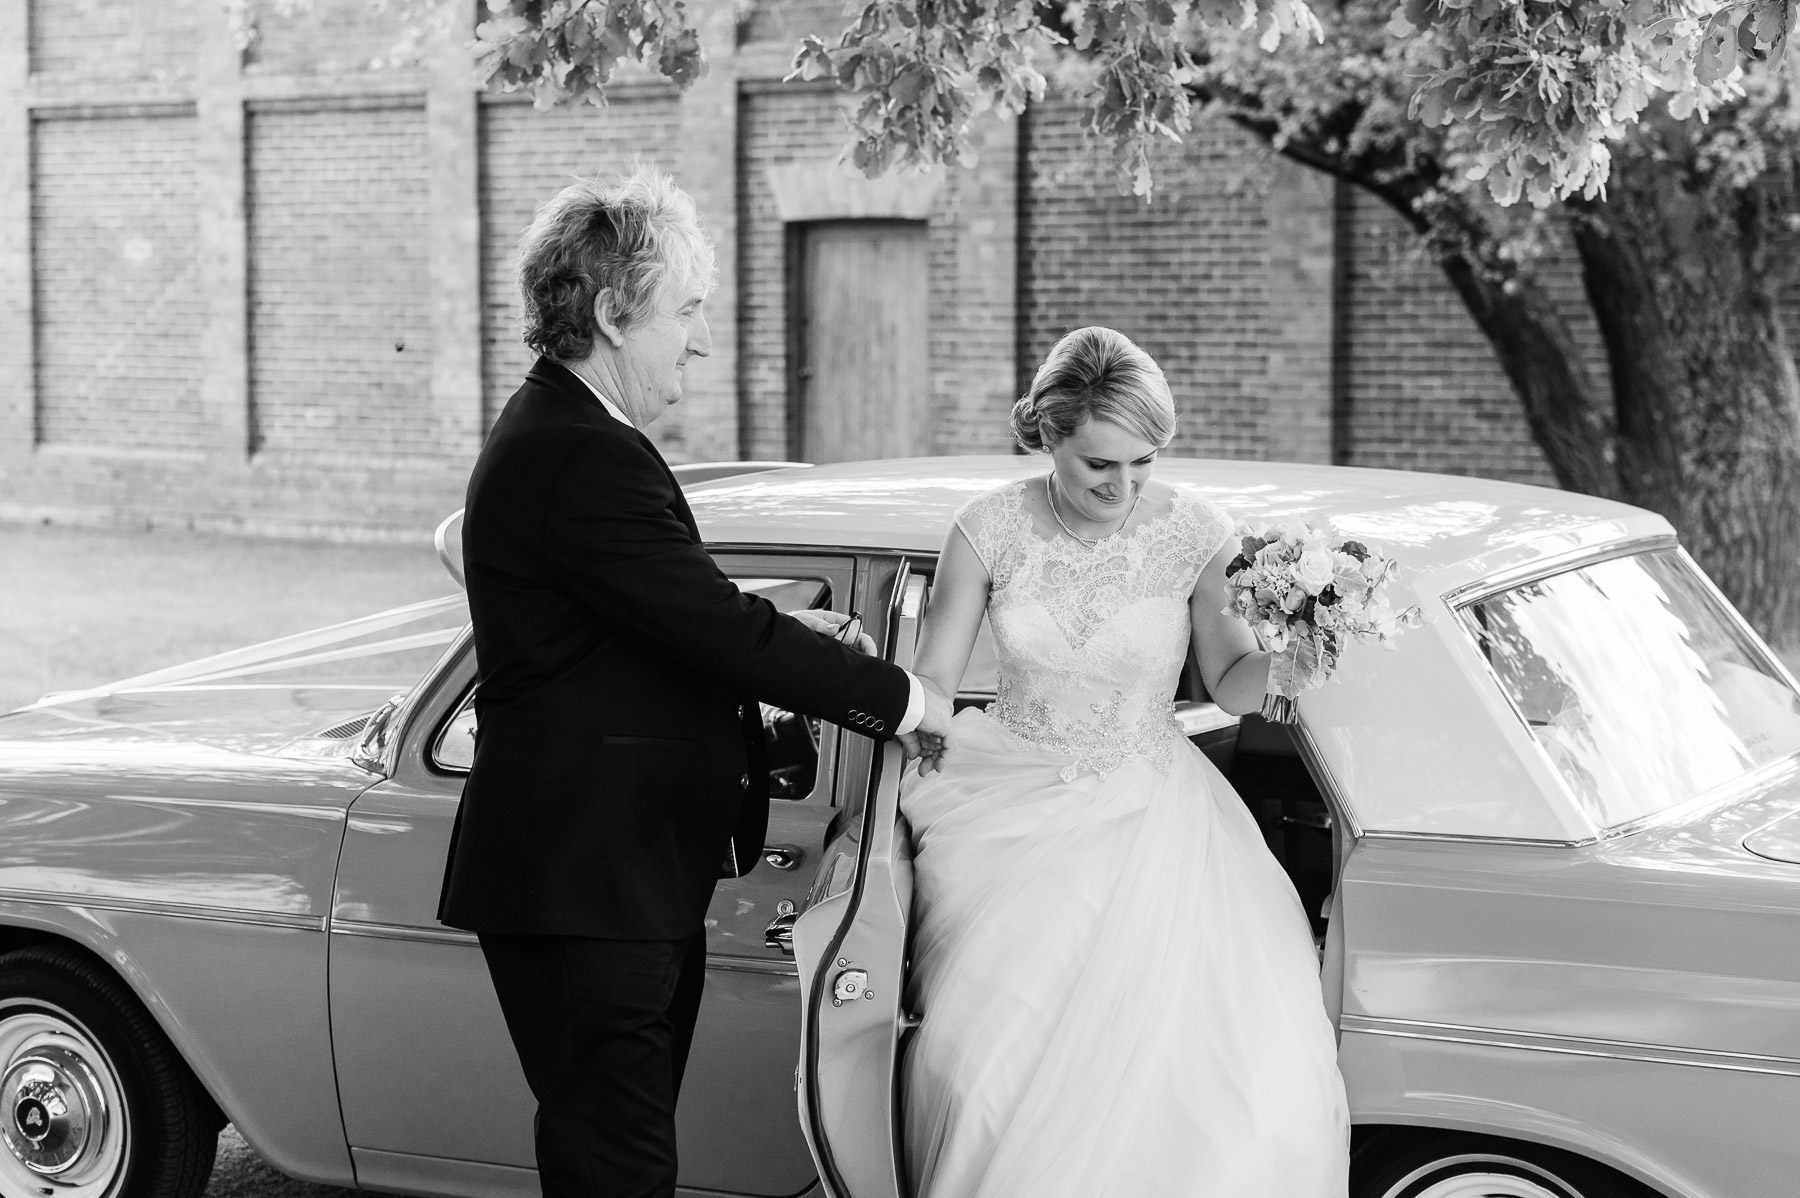 Marnie_and_Charlie_Yarra_Valley_Wedding_Blog-34.jpg